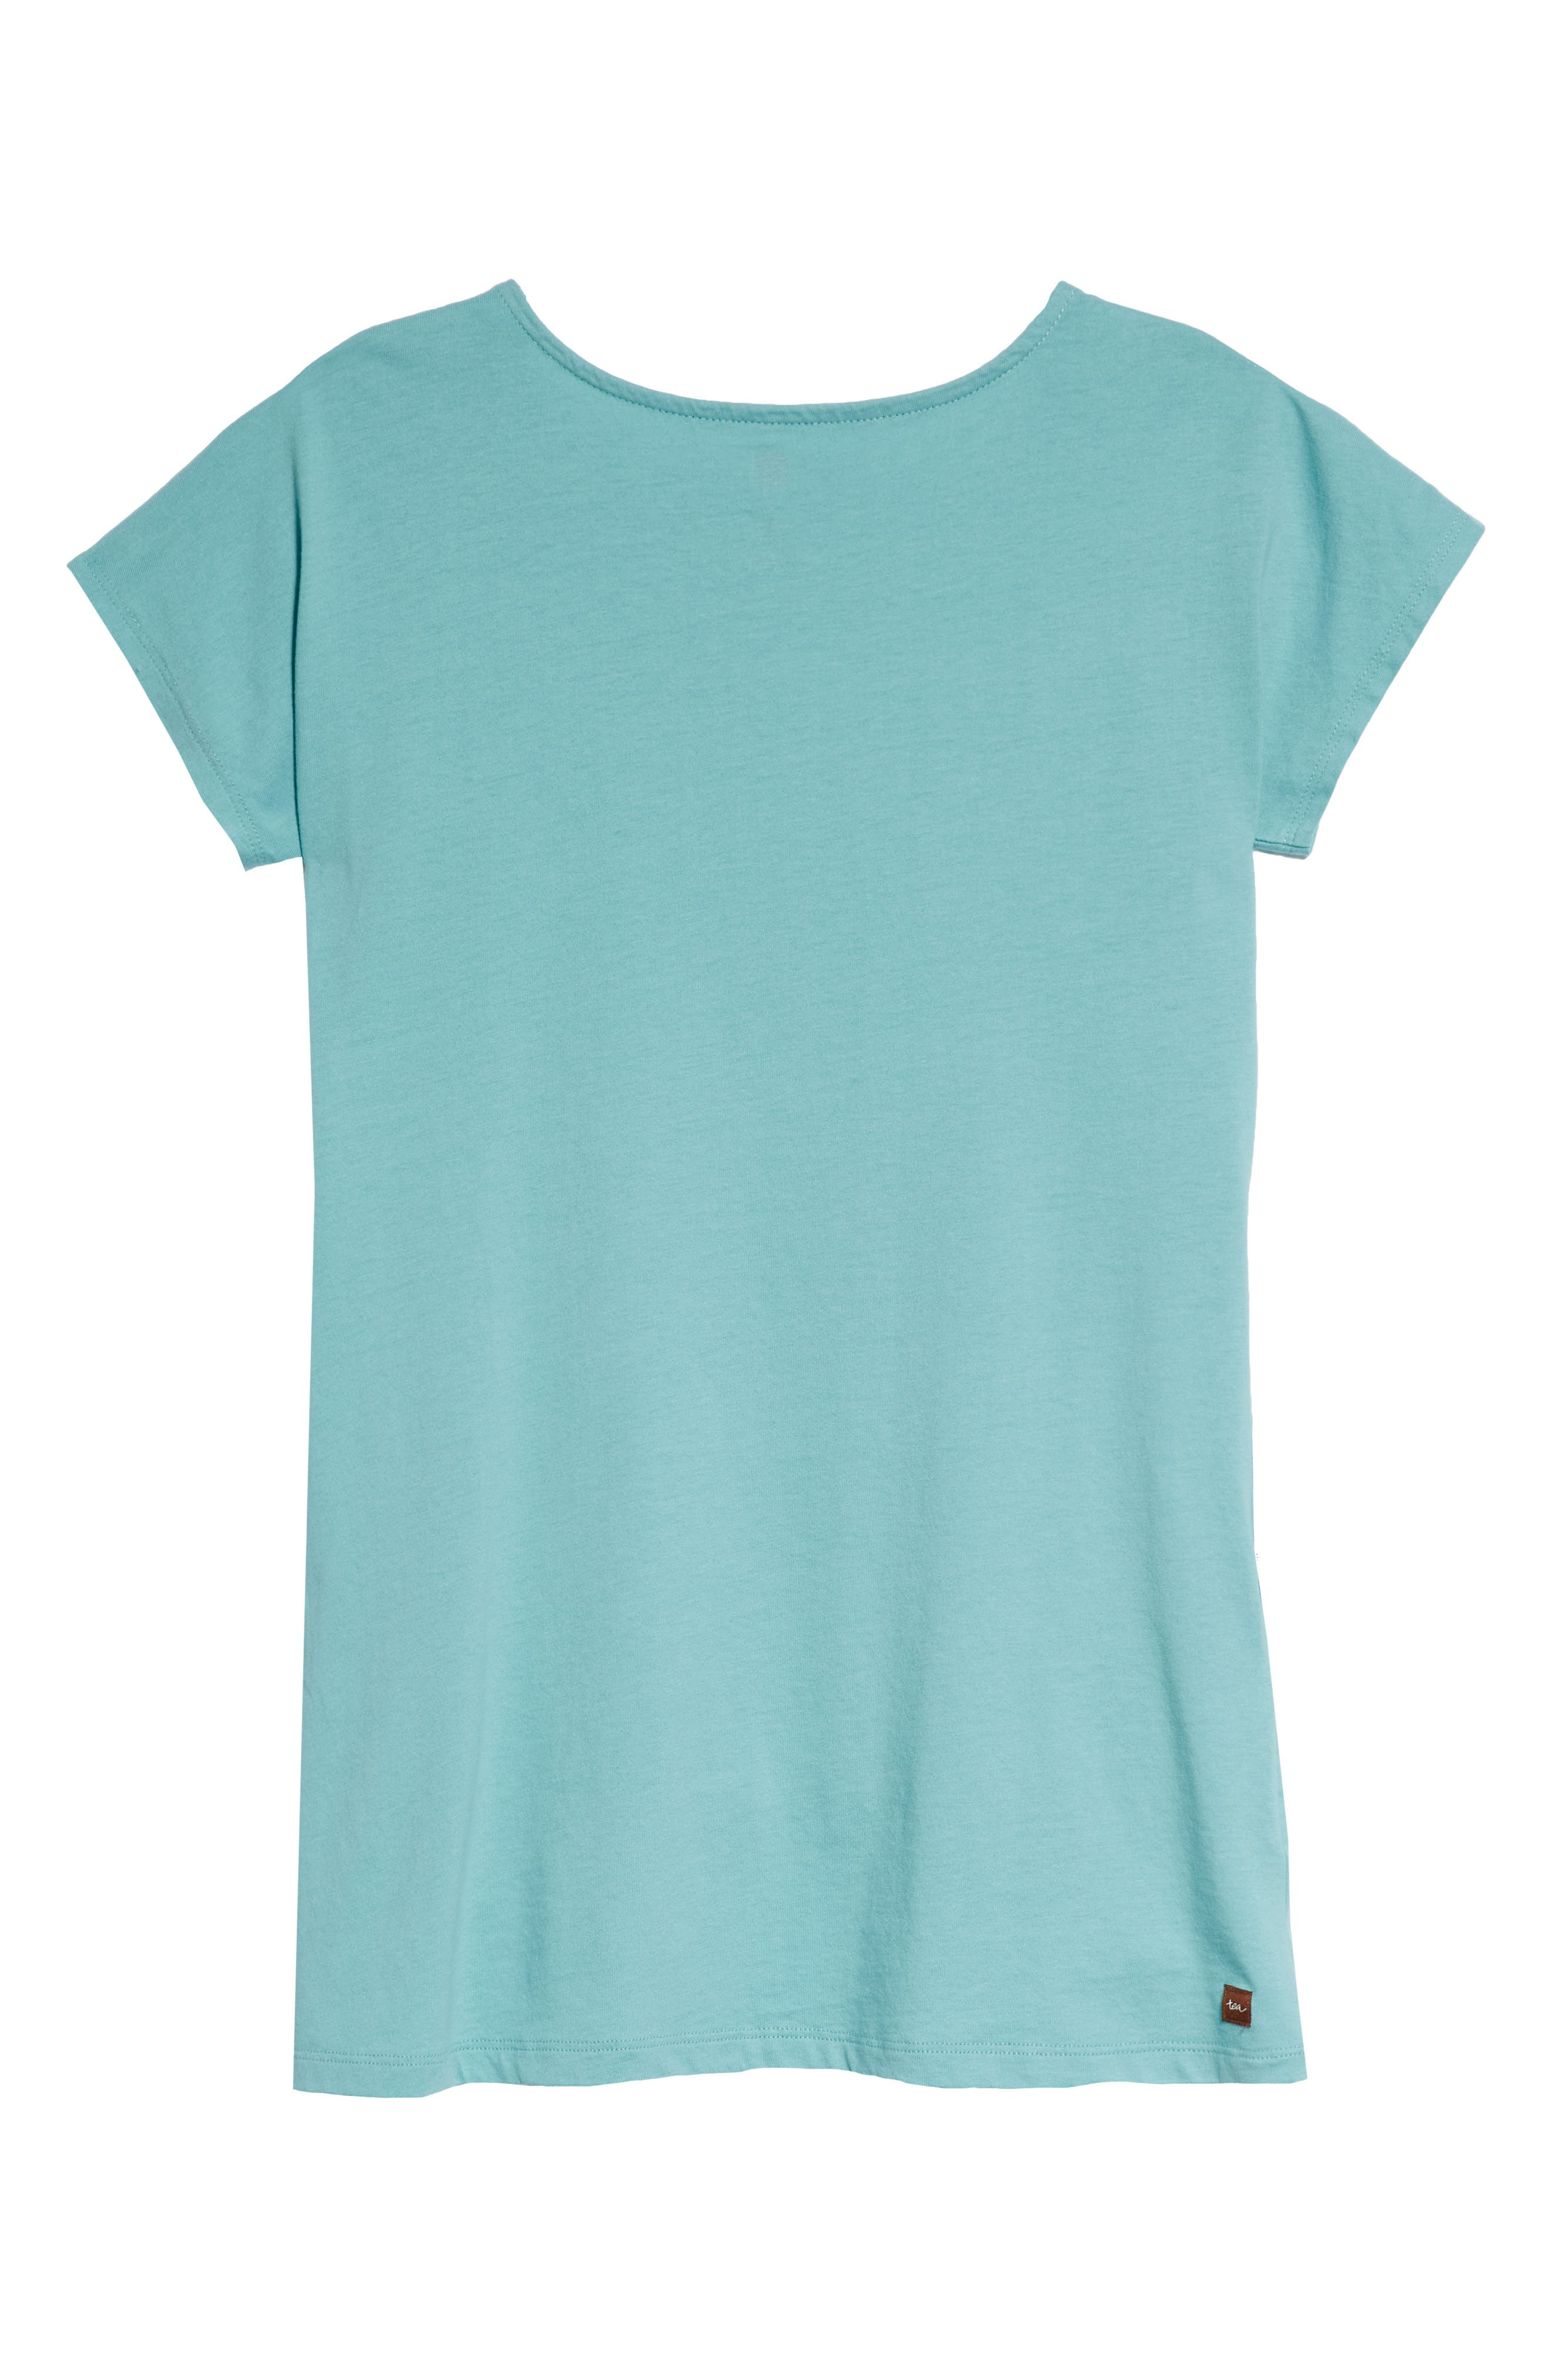 Alternate Image 2  - Tea Collection Button Shoulder T-Shirt Dress (Toddler Girls, Little Girls & Big Girls)